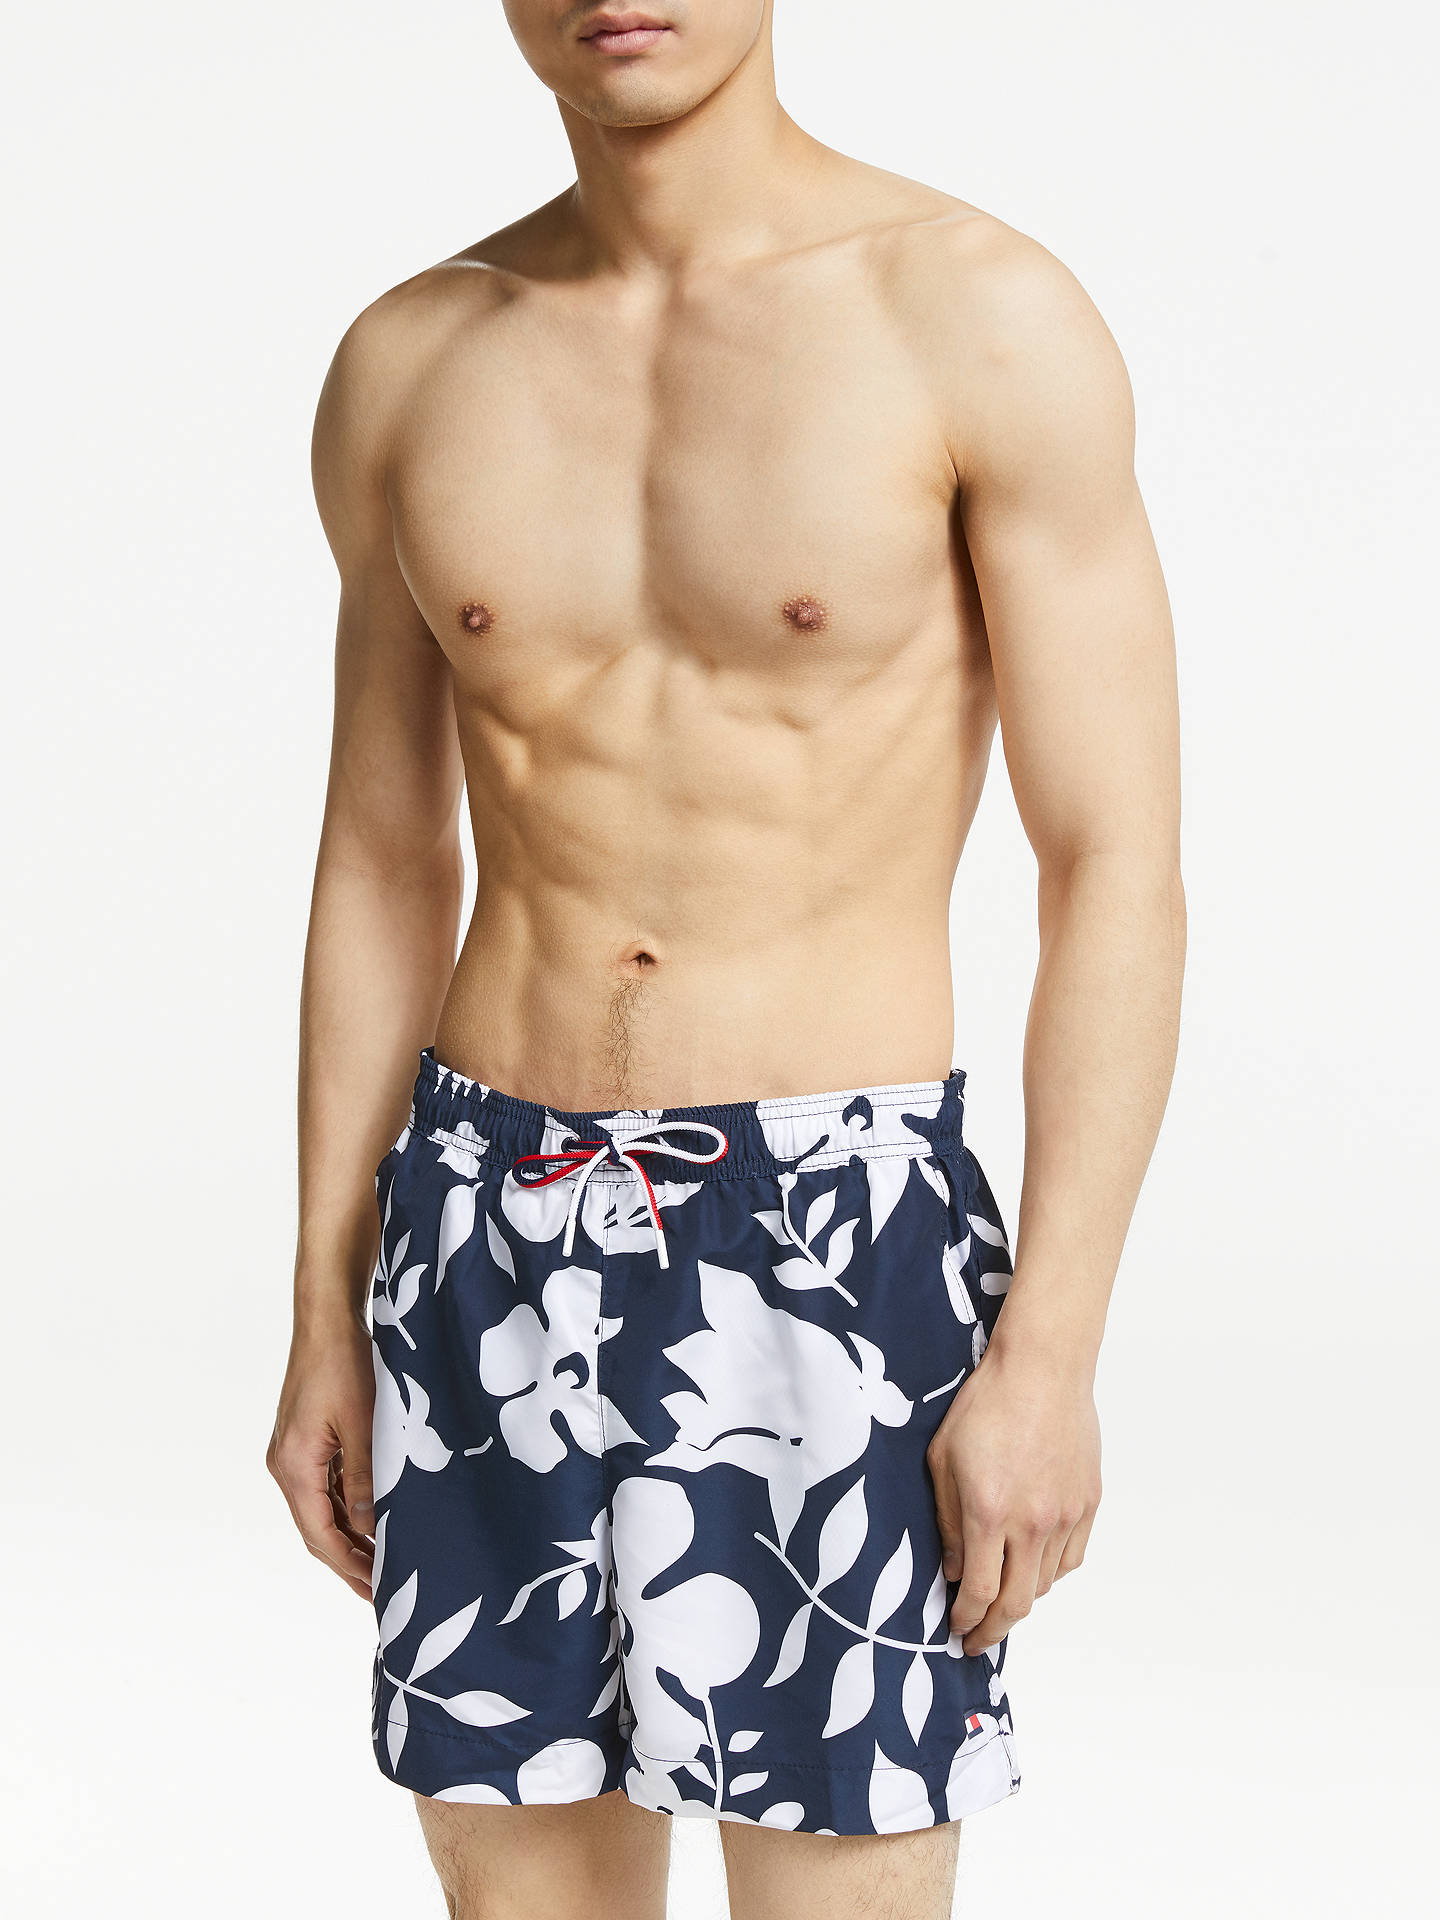 c3e1dc4d3a Buy Tommy Hilfiger Flower Print Print Swim Shorts, Blue, M Online at  johnlewis.